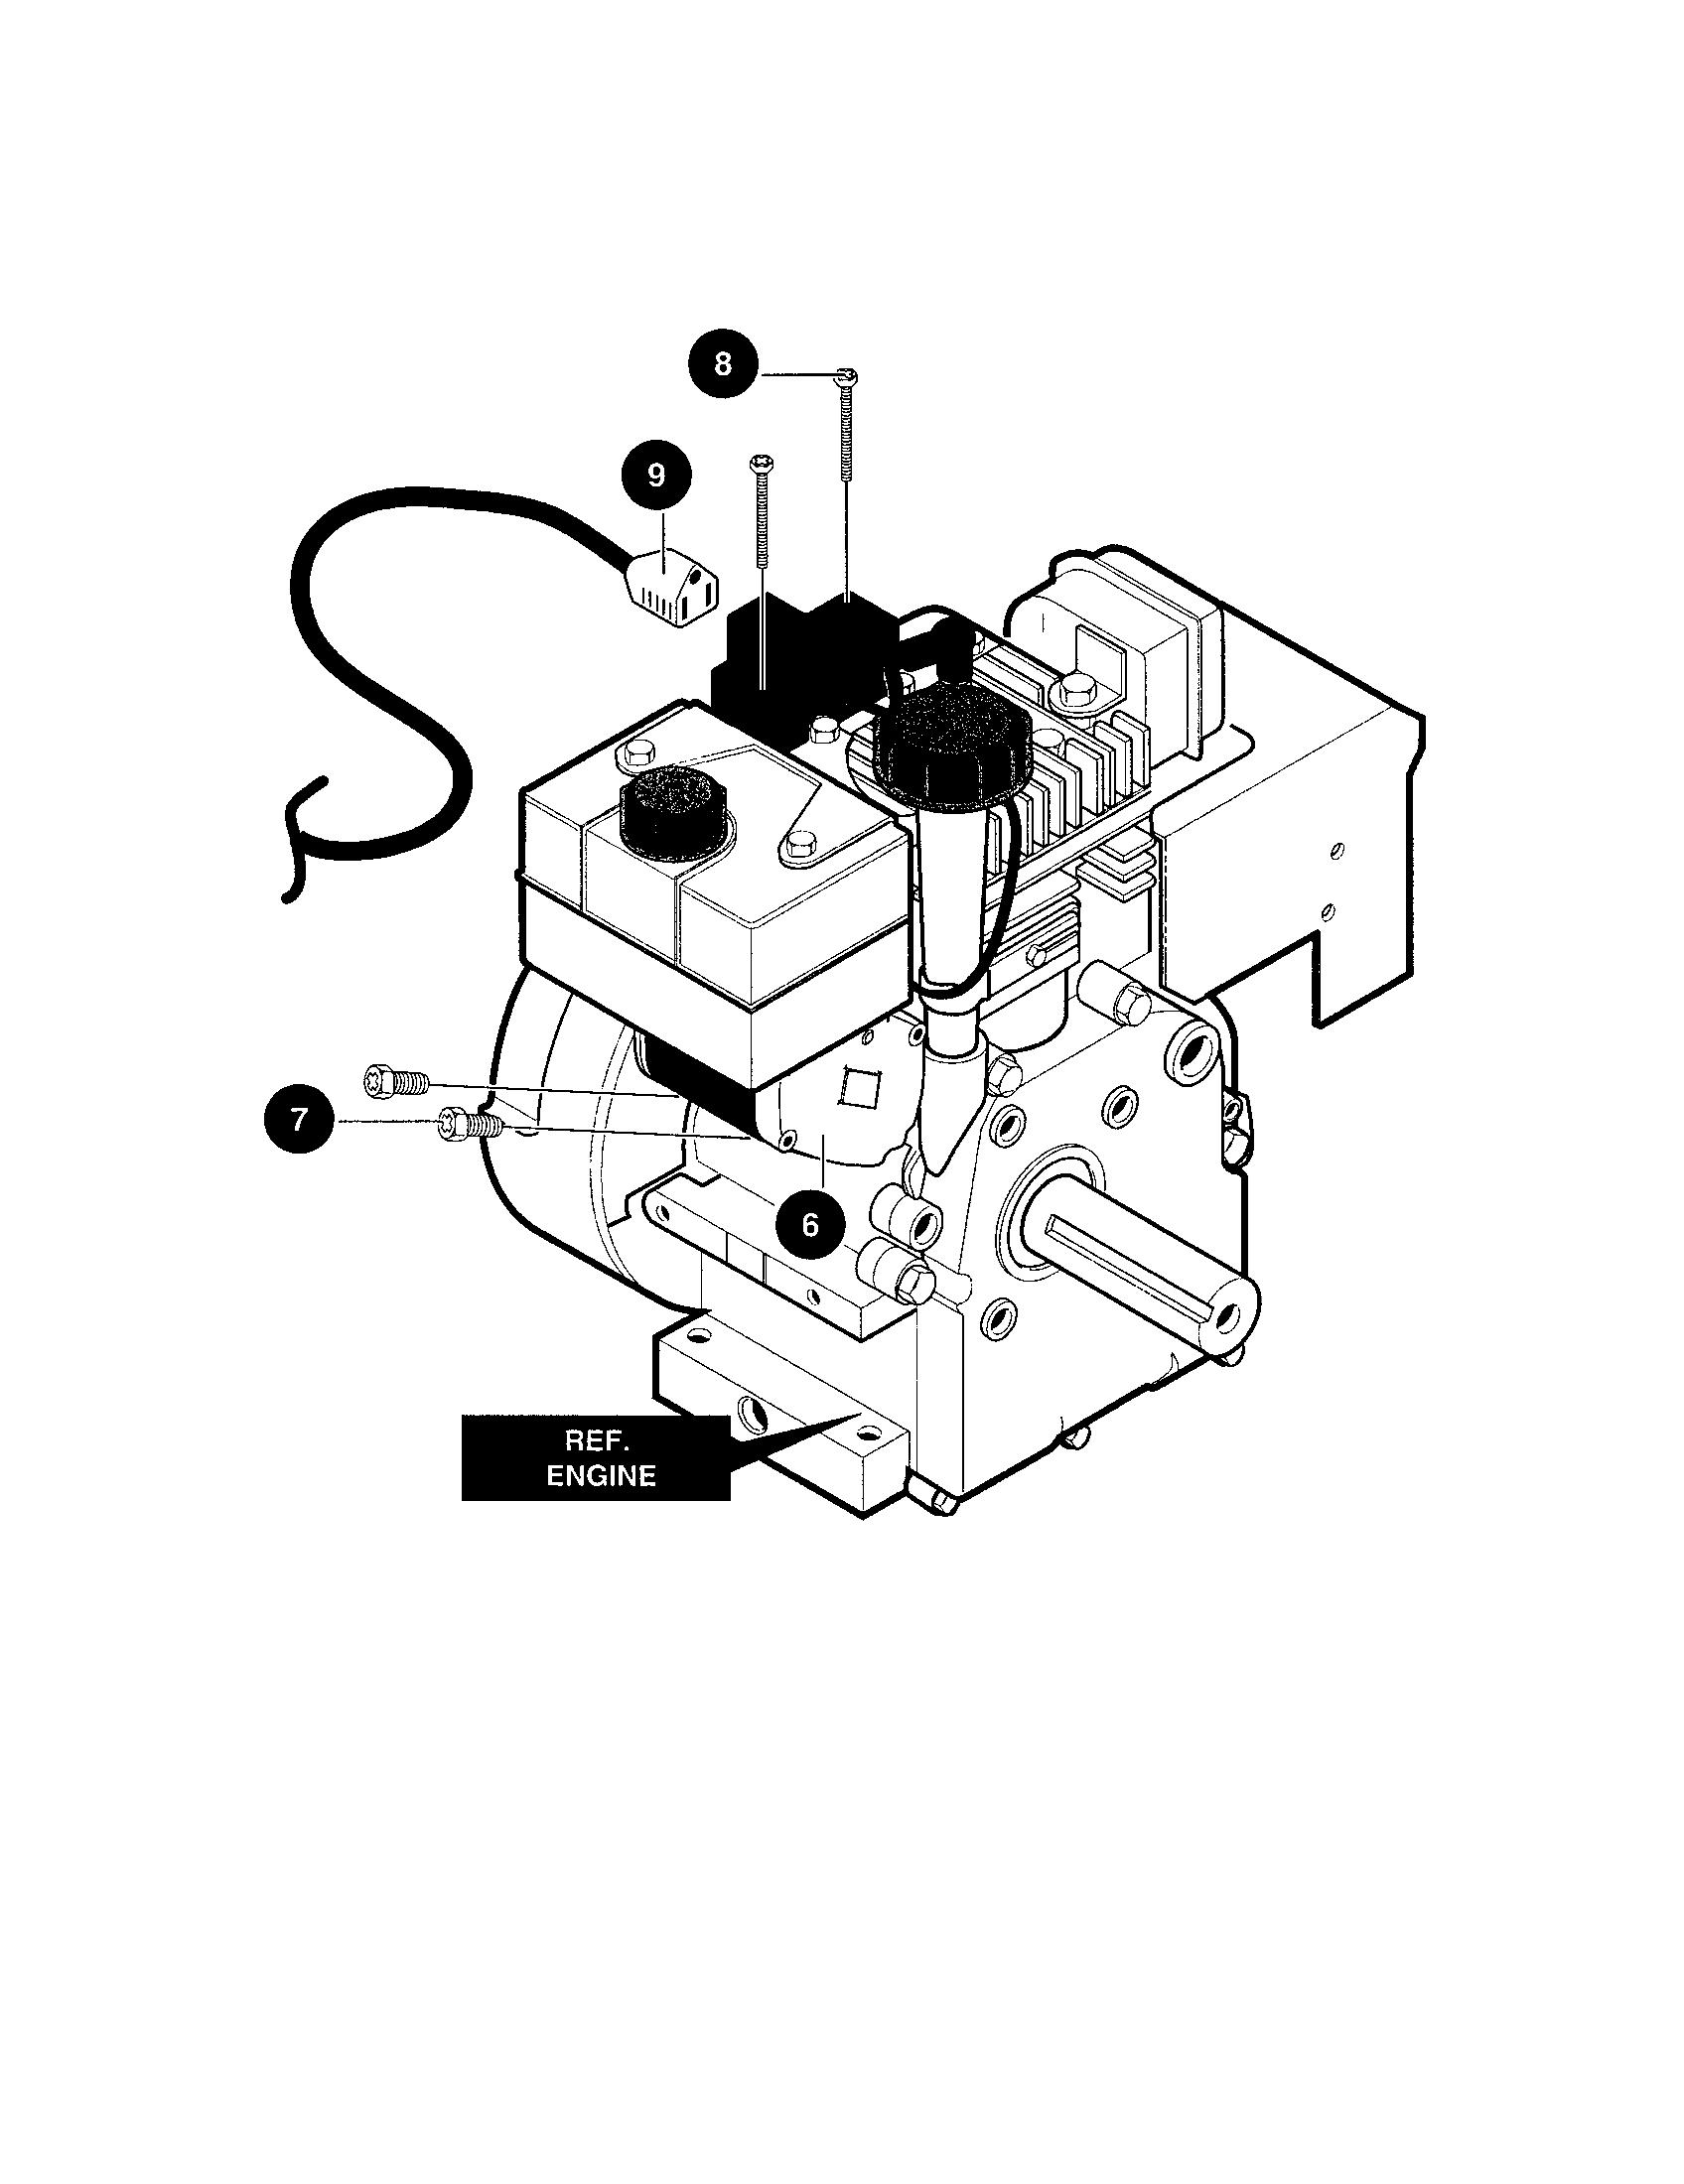 hight resolution of craftsman 536886480 electric starter diagram